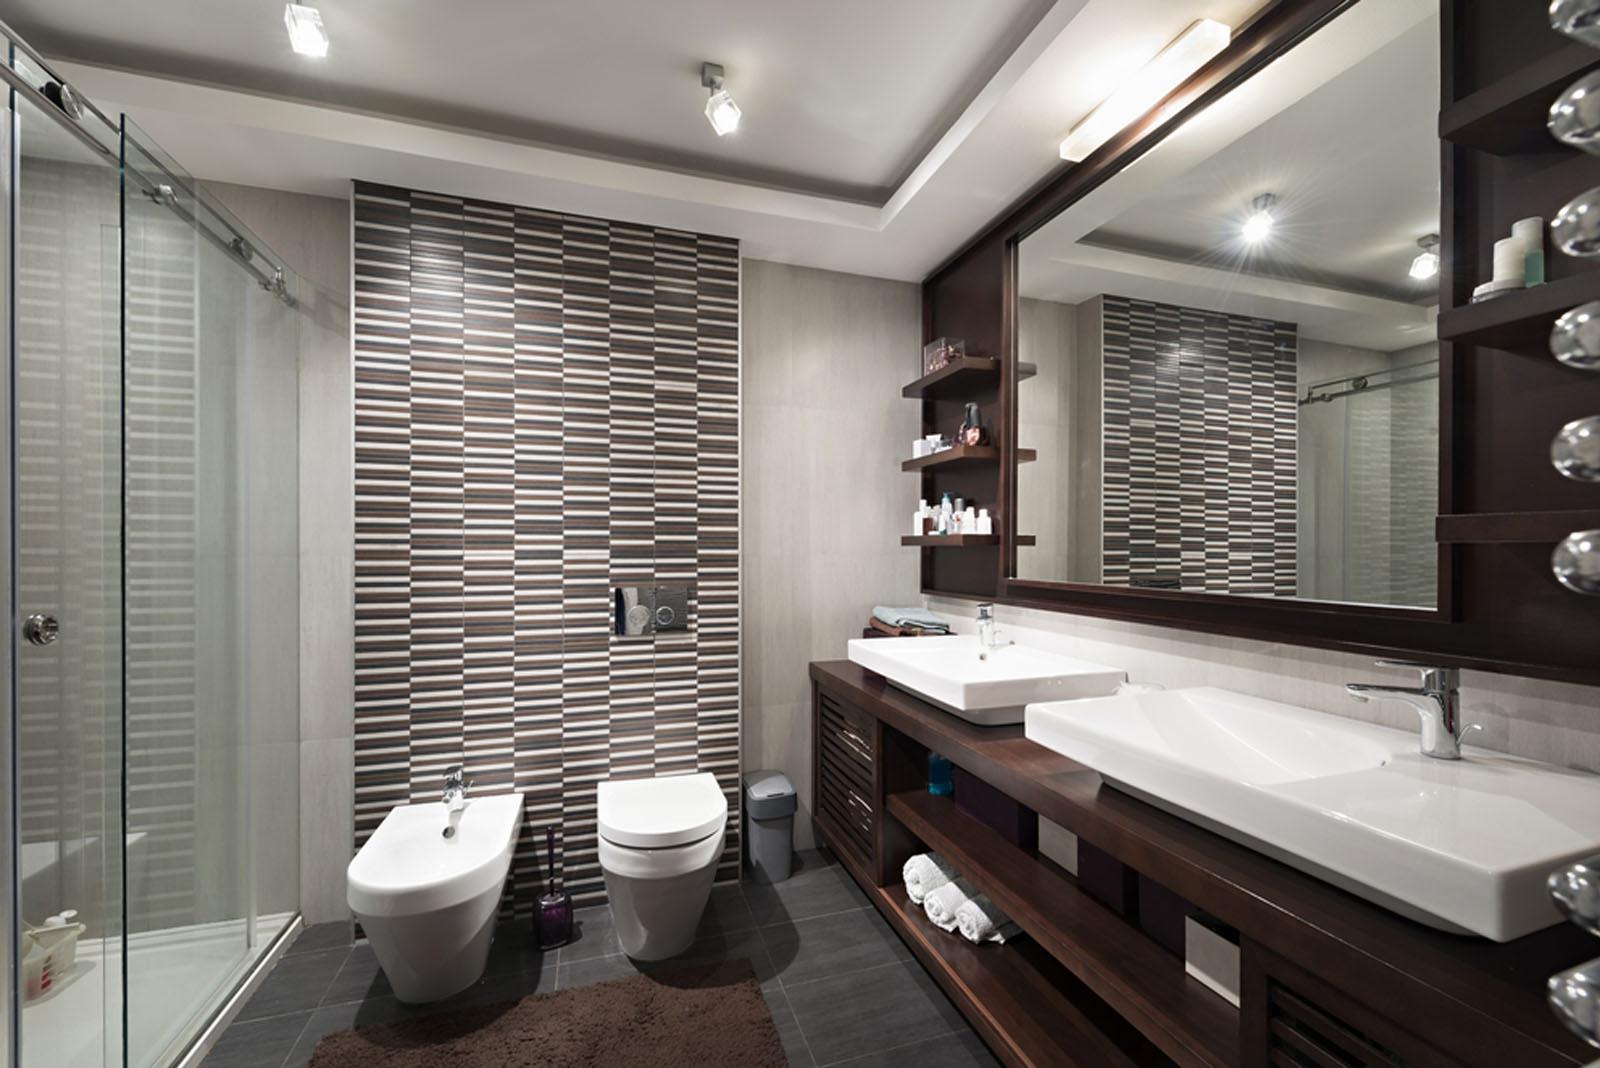 Bathroom design Kincir Bali WP 5